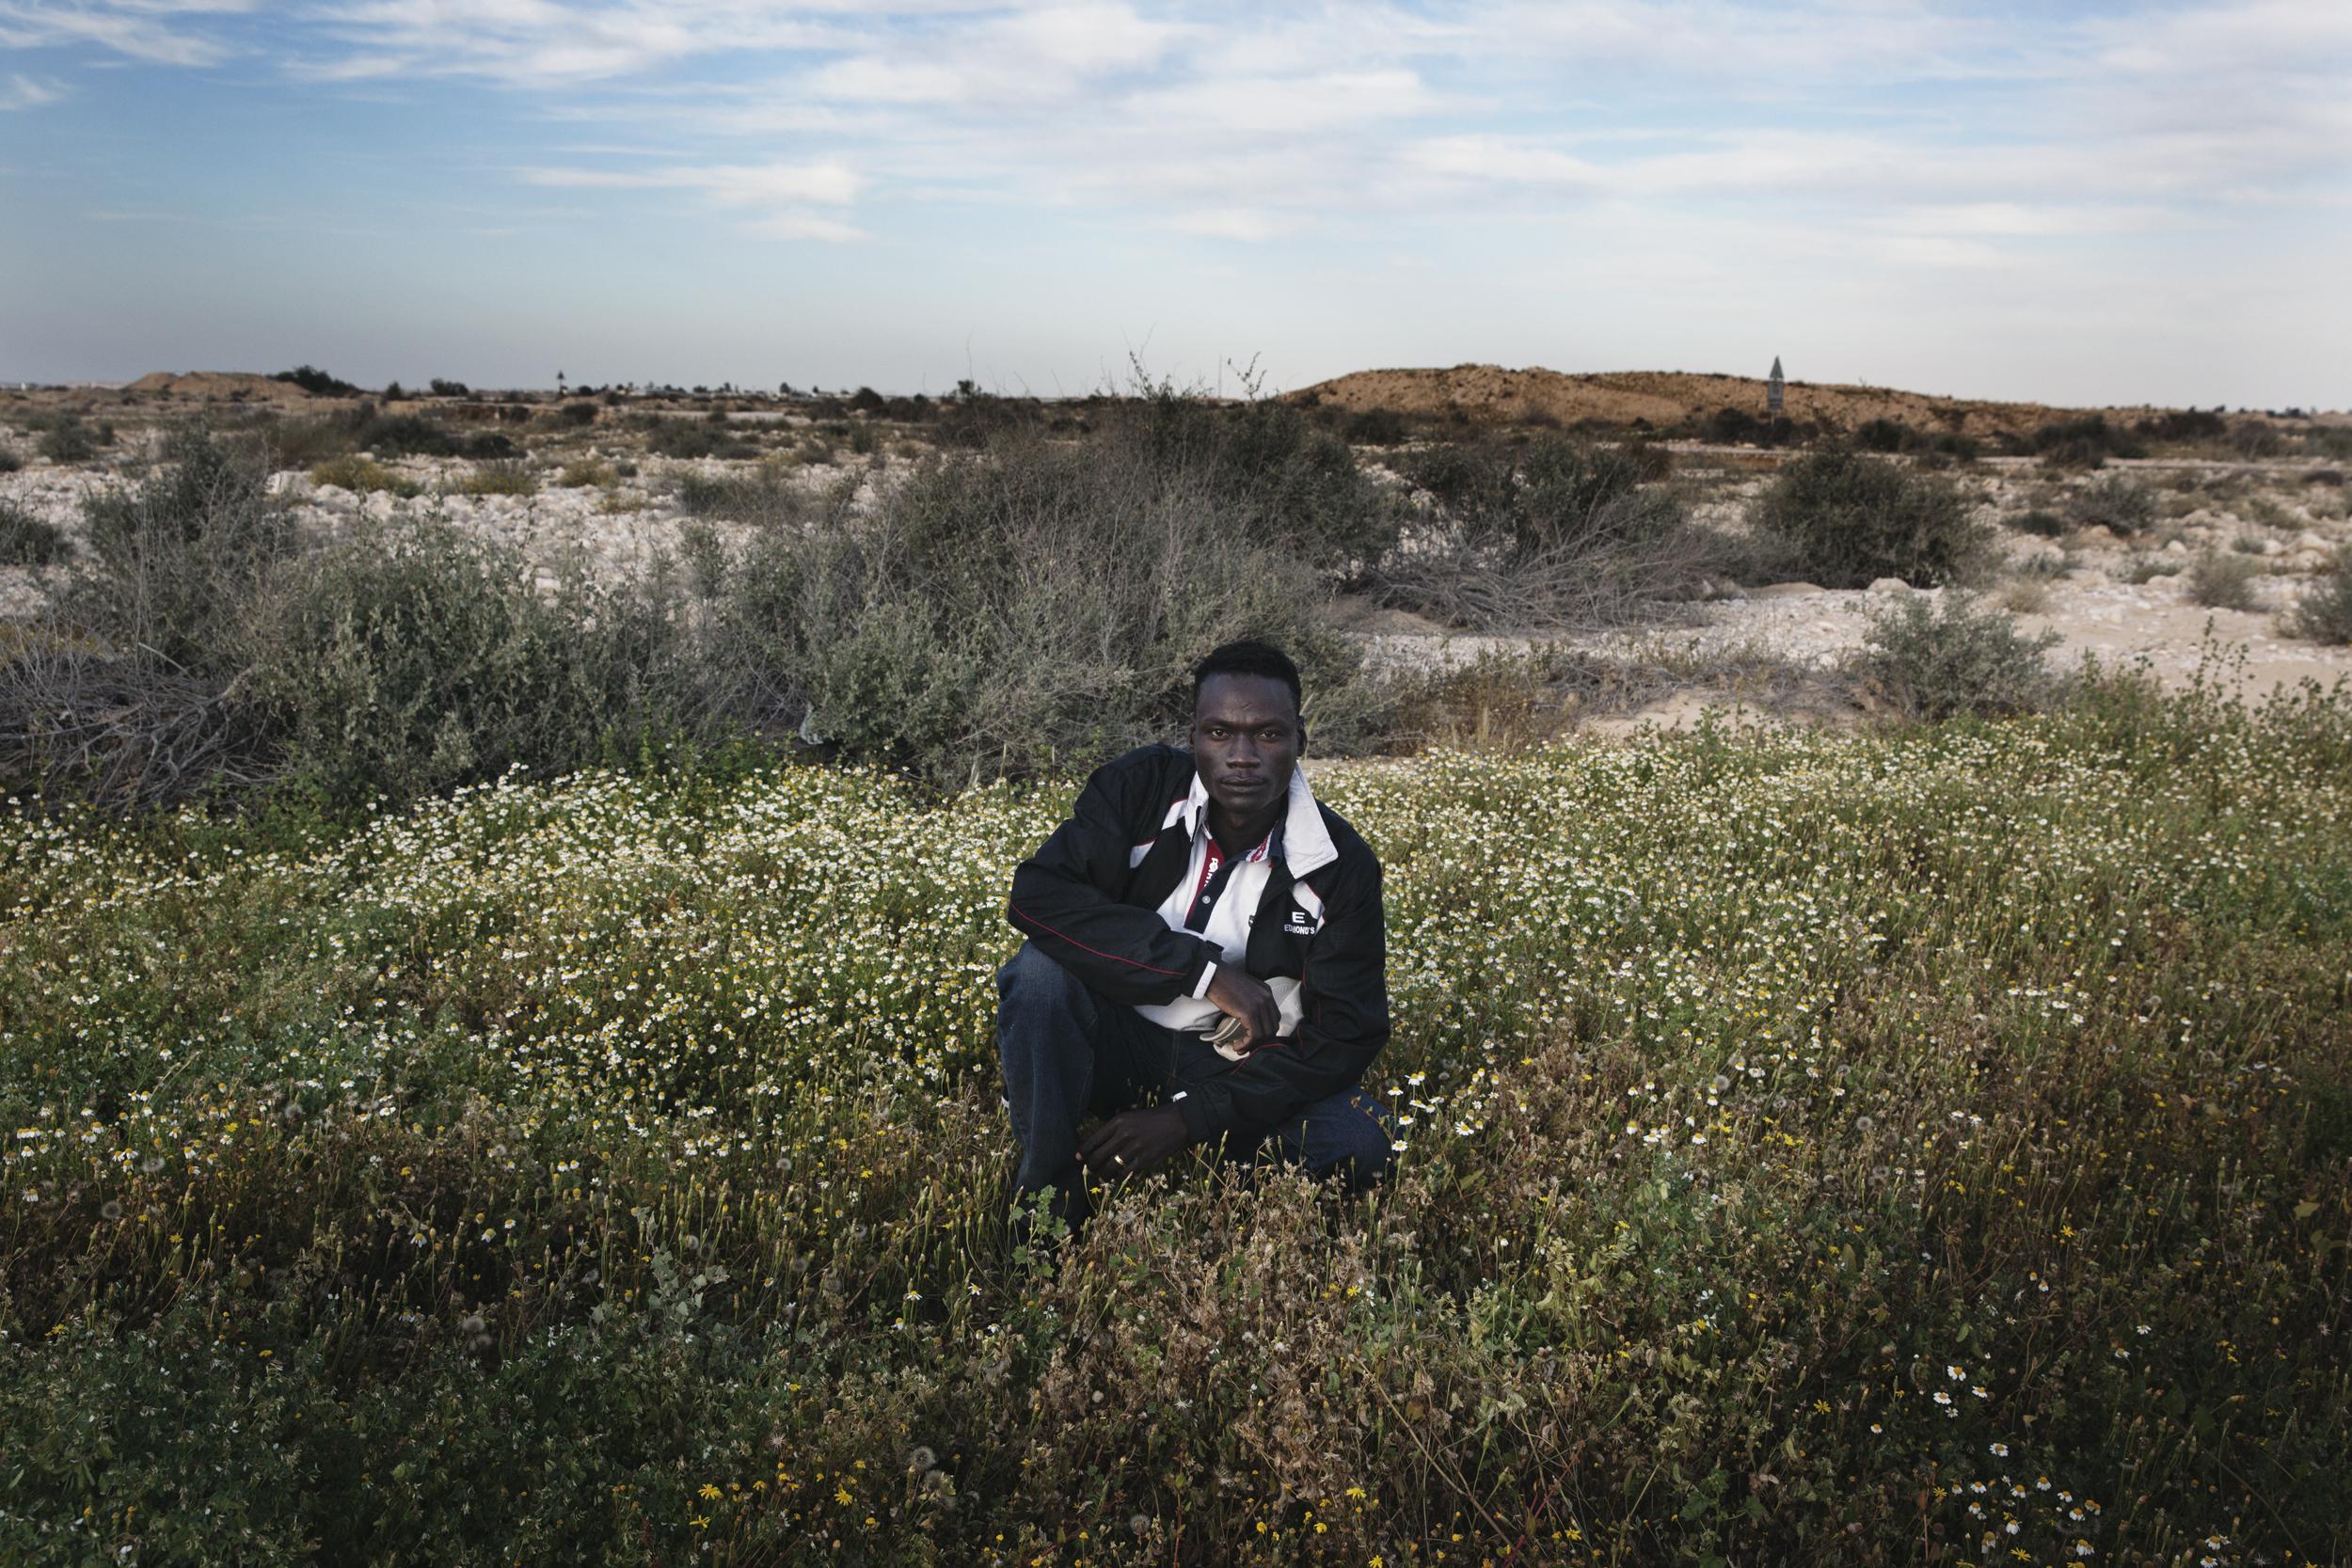 A Sudanese detainee outside of Holot detention center.